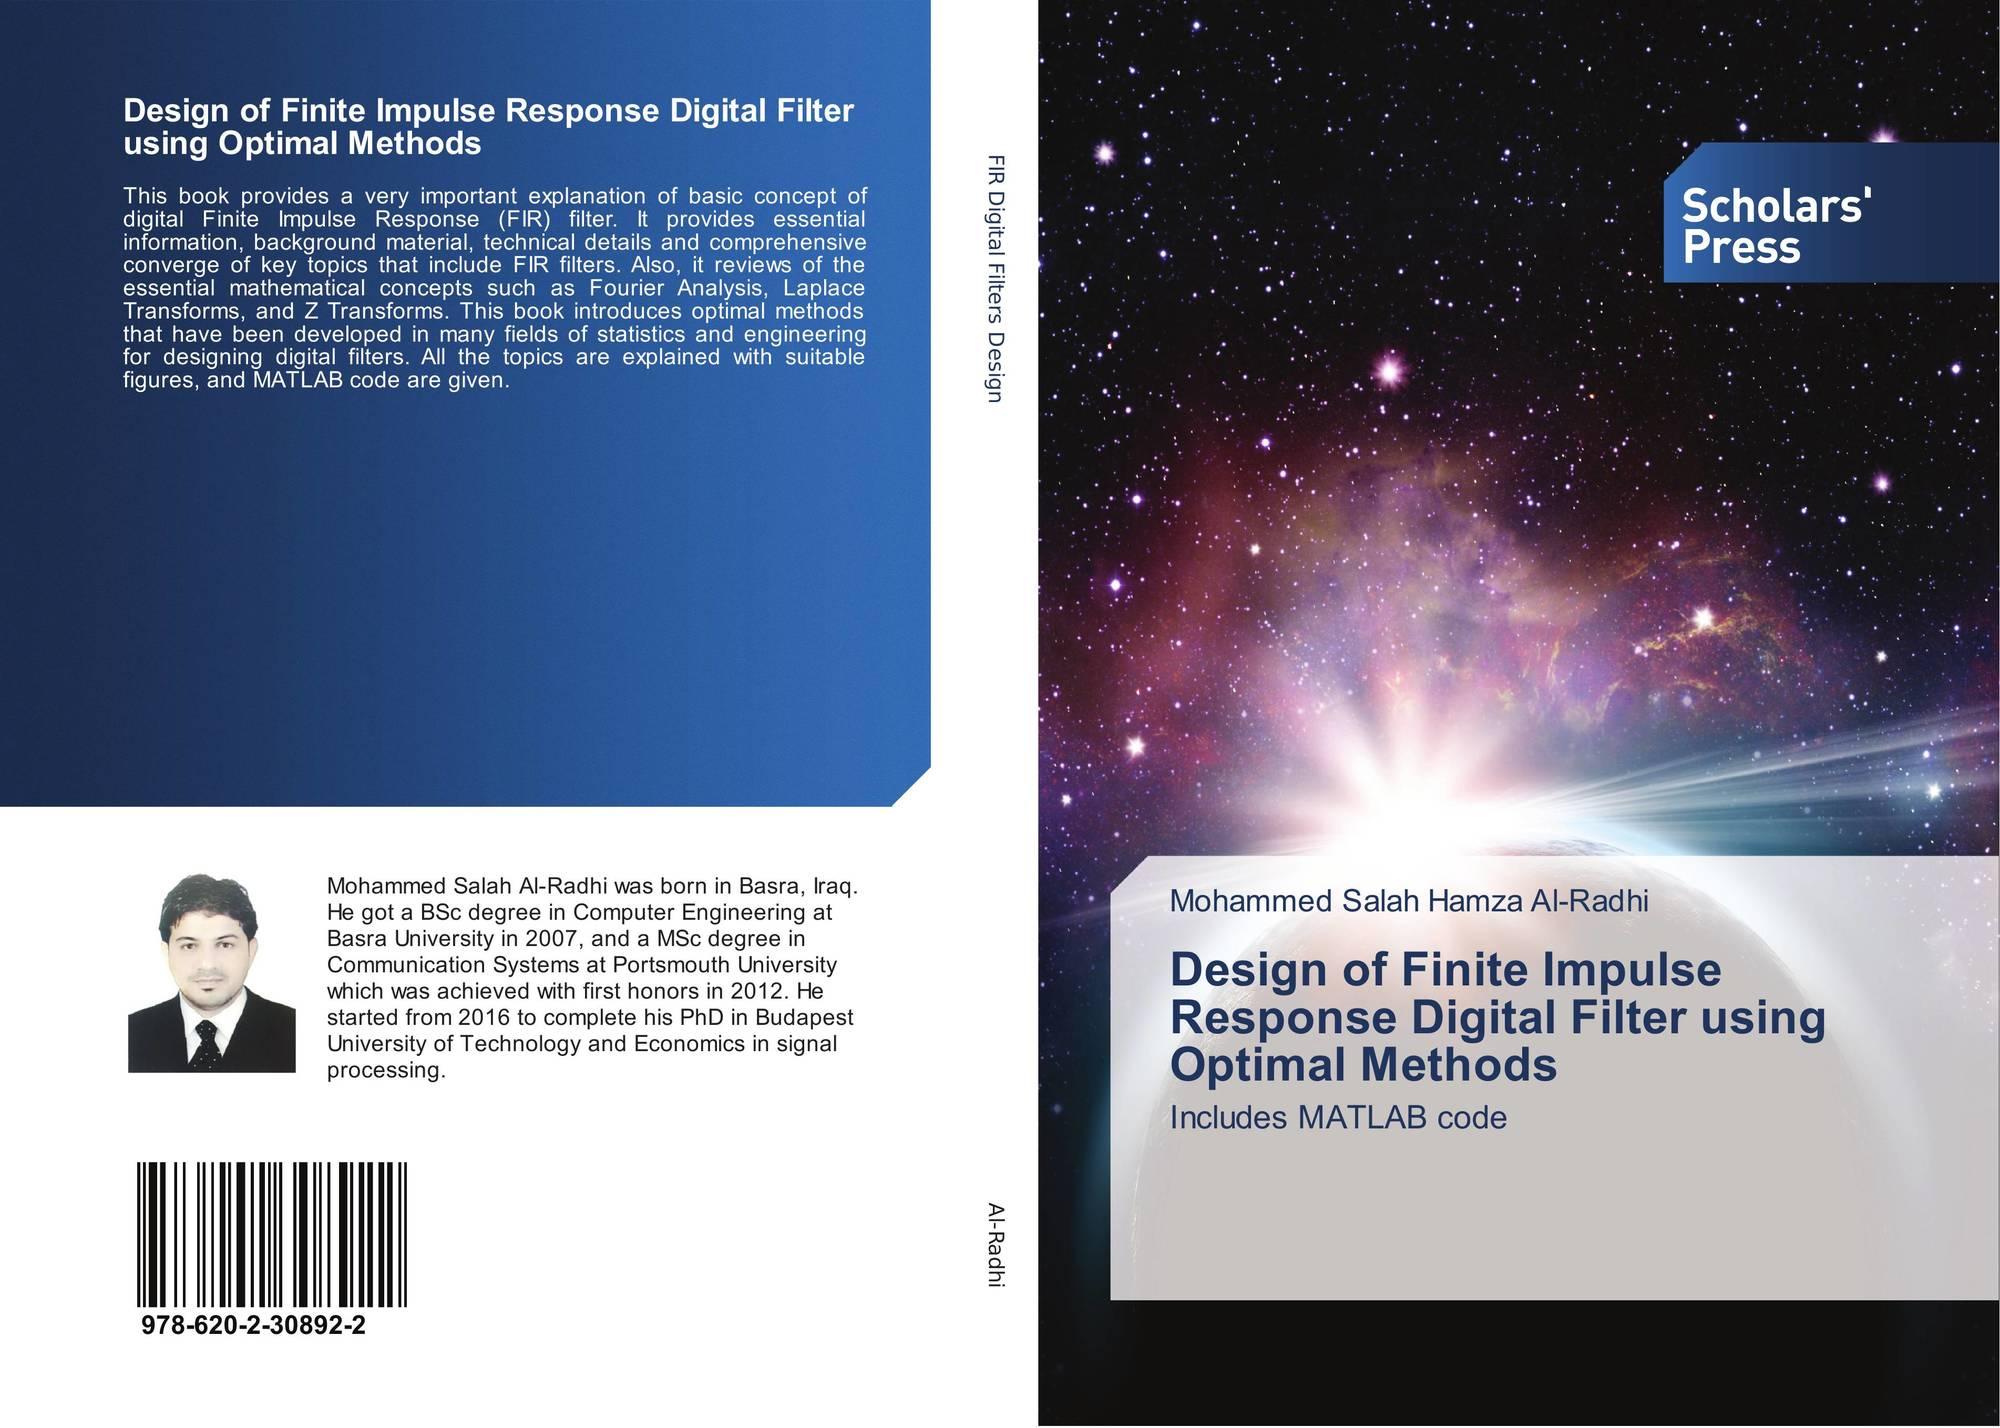 designing finite impulse response digital filter Novel particle swarm optimization for low pass fir  of linear phase digital low pass finite impulse response  of designing the fir filter using an.